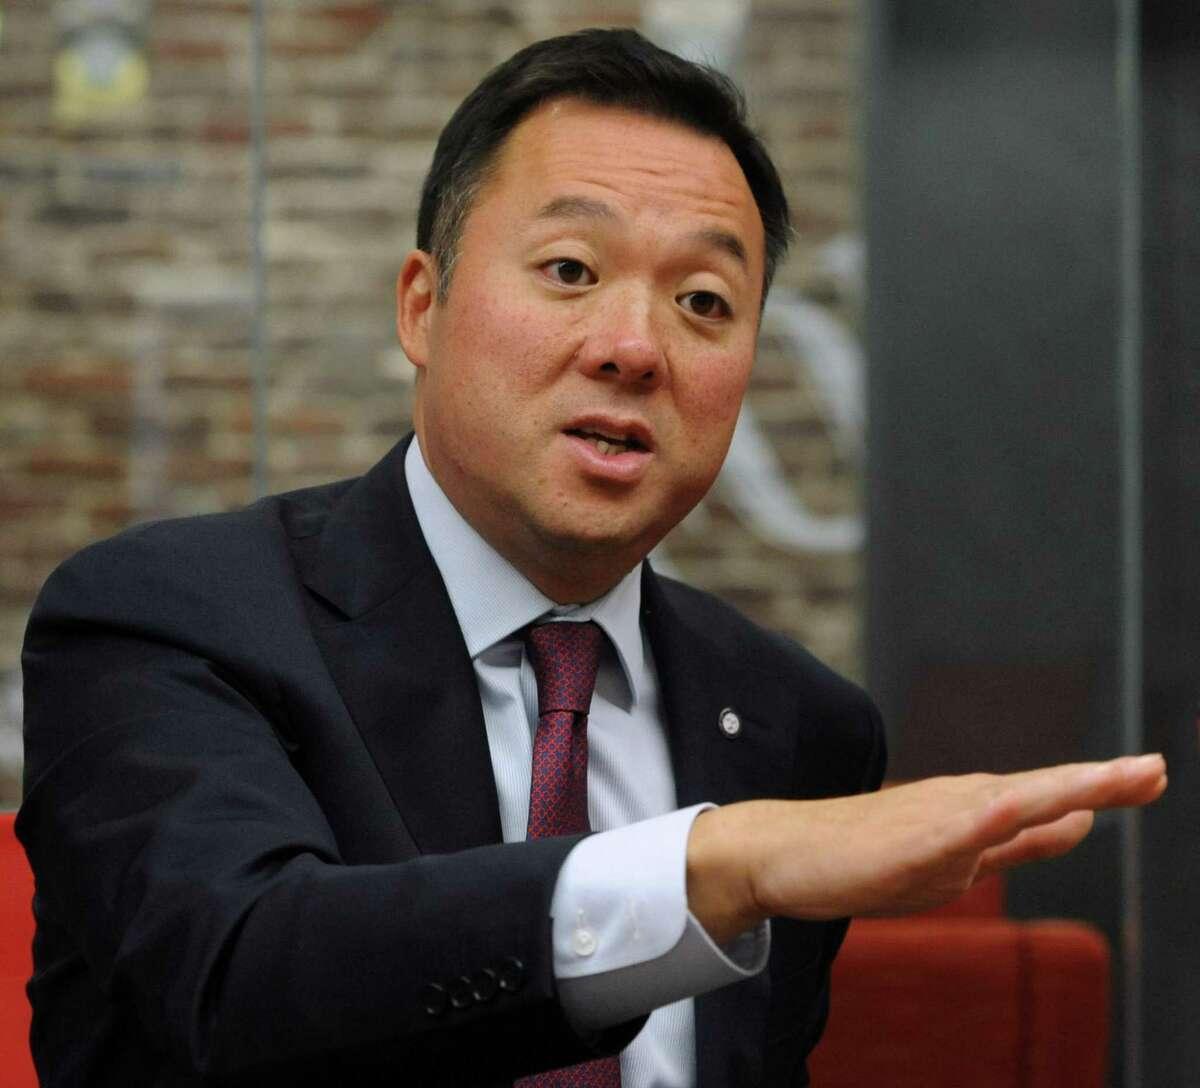 Connecticut Attorney General William Tong opposes Purdue Pharma's proposed 2021 employee bonuses.